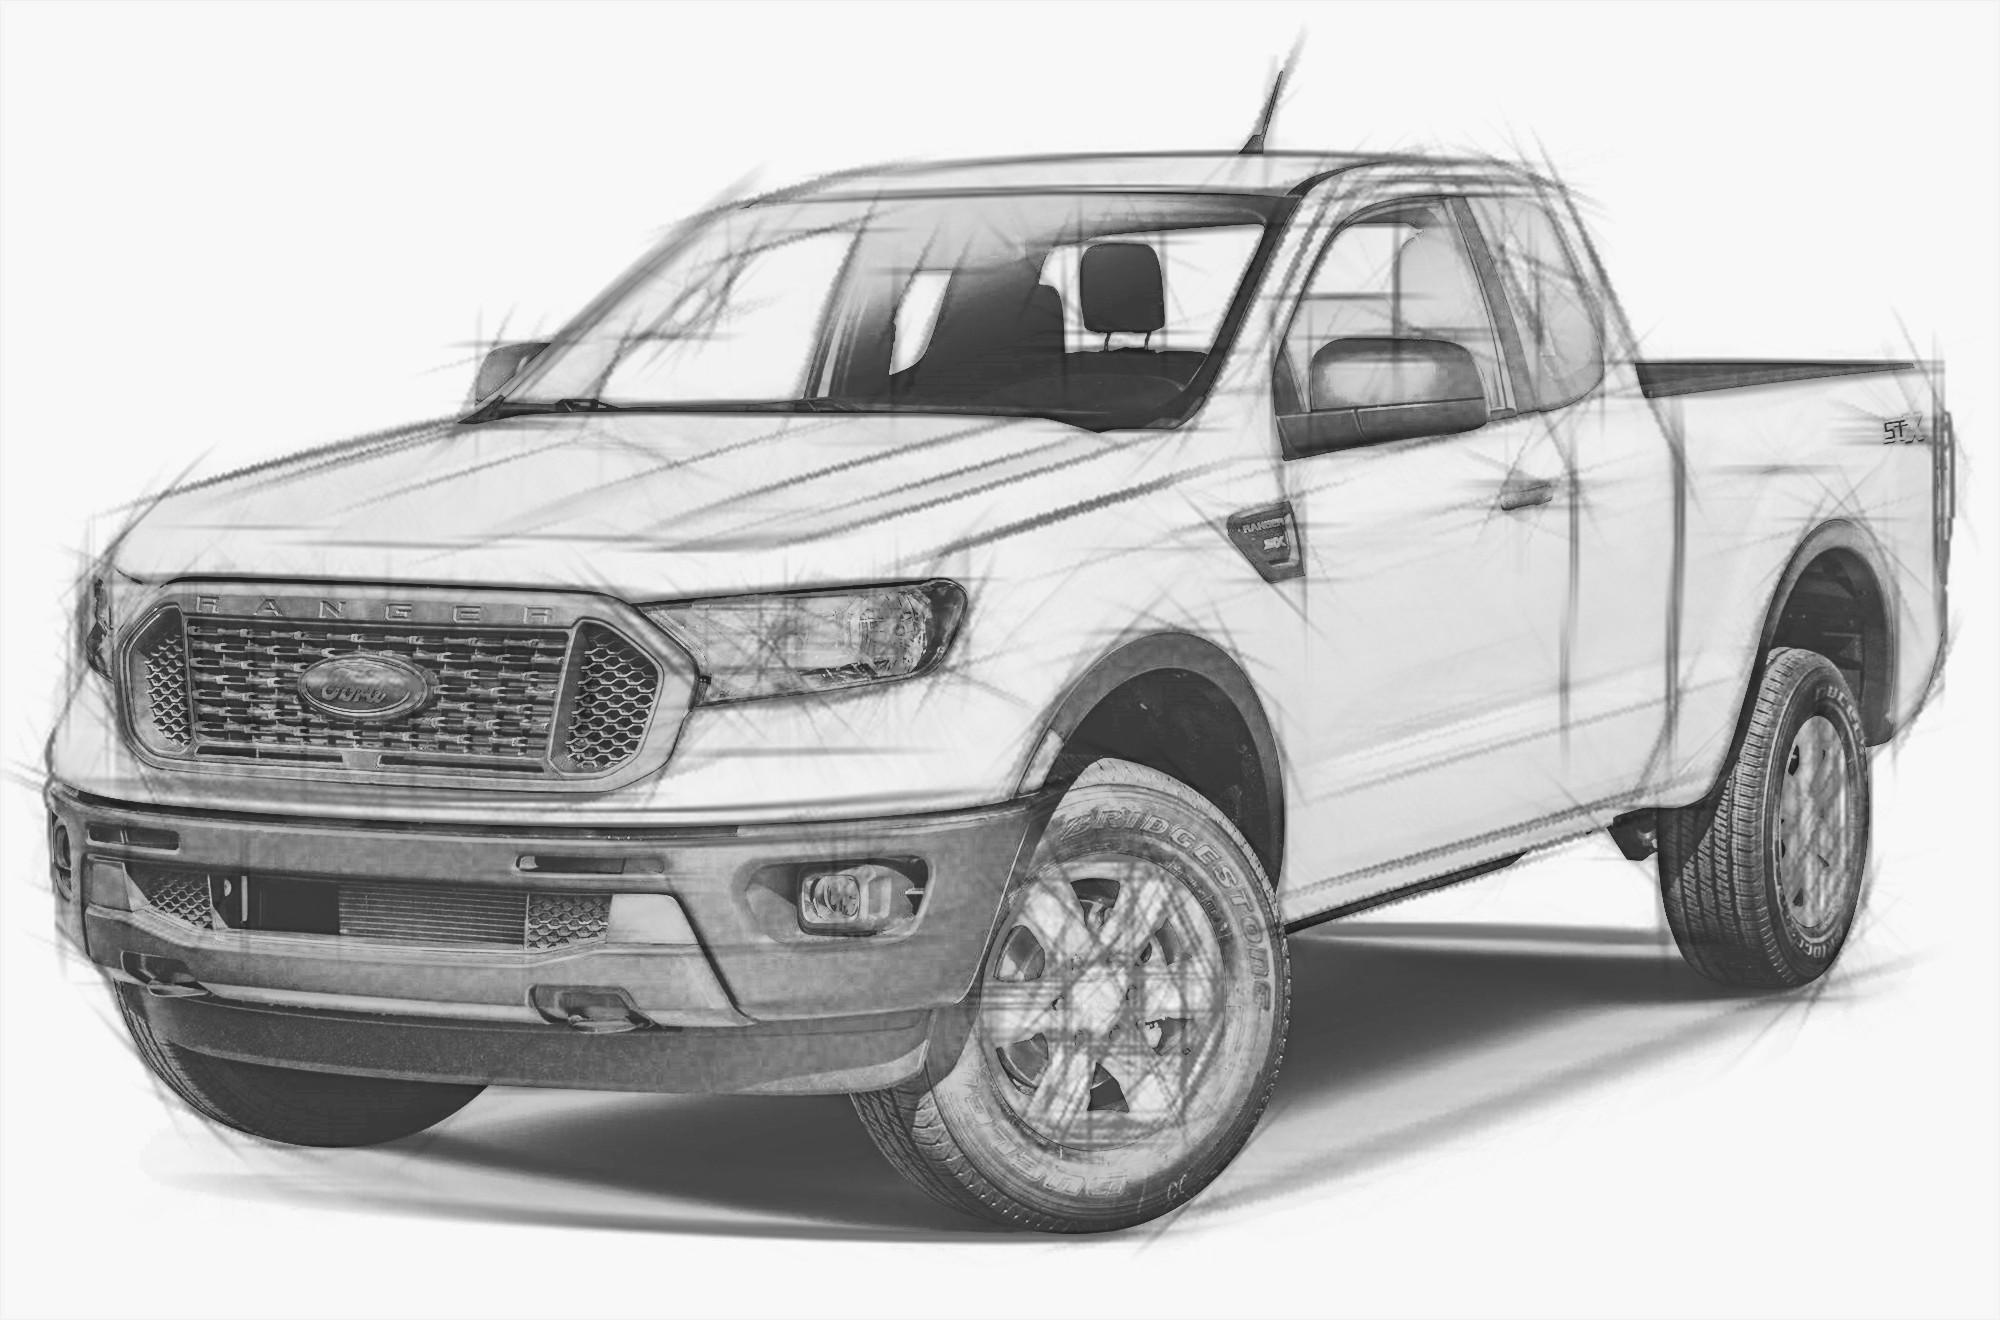 Ford-Ranger-LED-Bulbs-Replacement-Headlights-Brake-Reverse-Lights